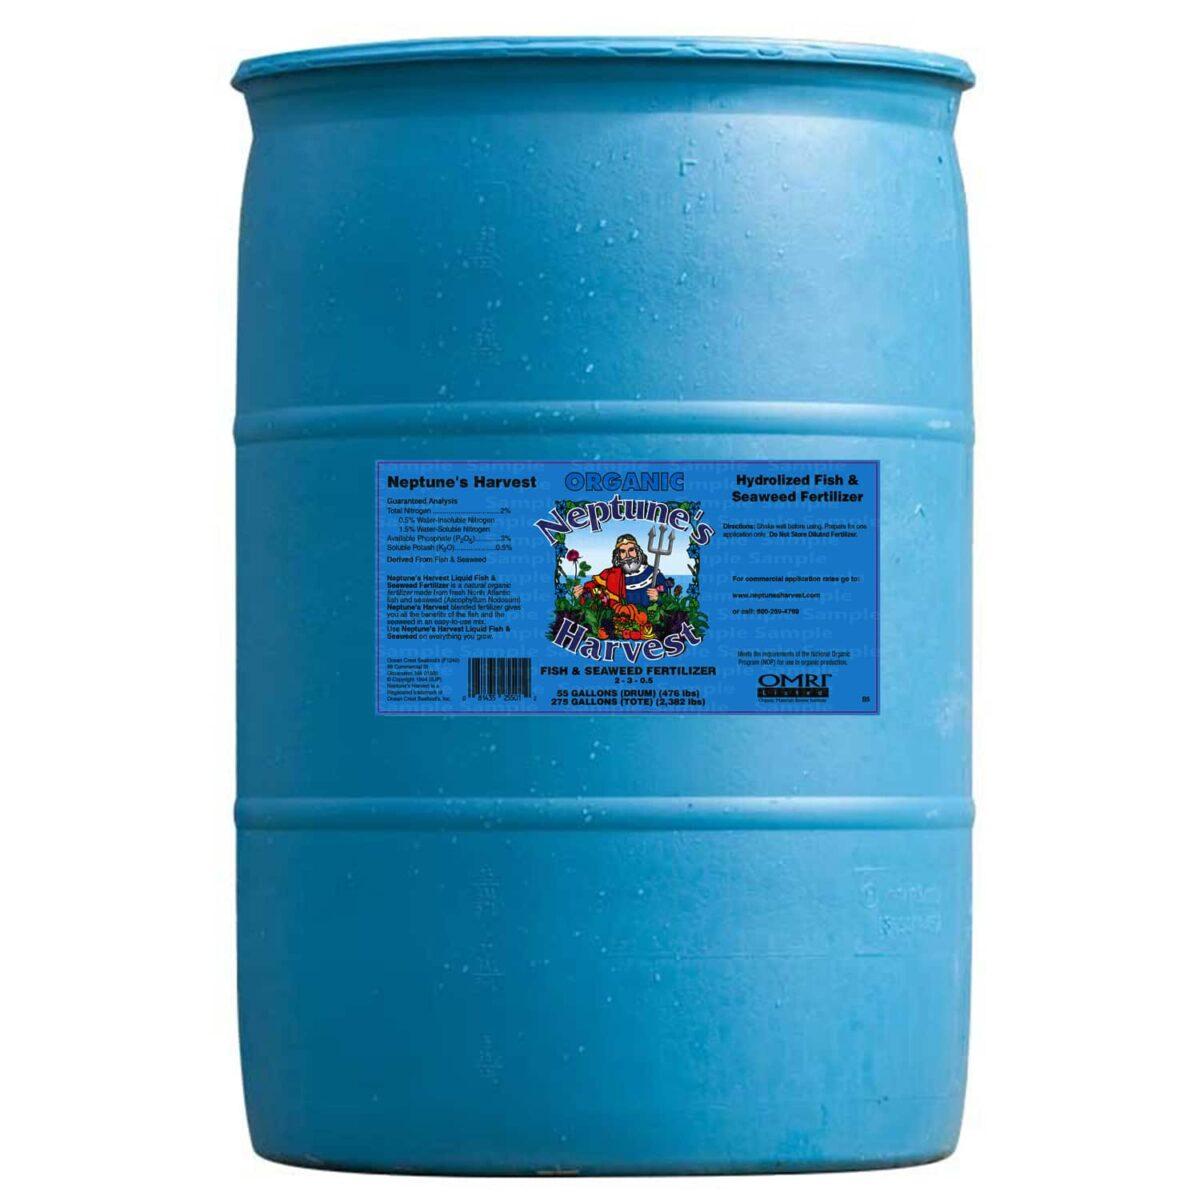 55 gallon barrel fish seaweed fertilizer